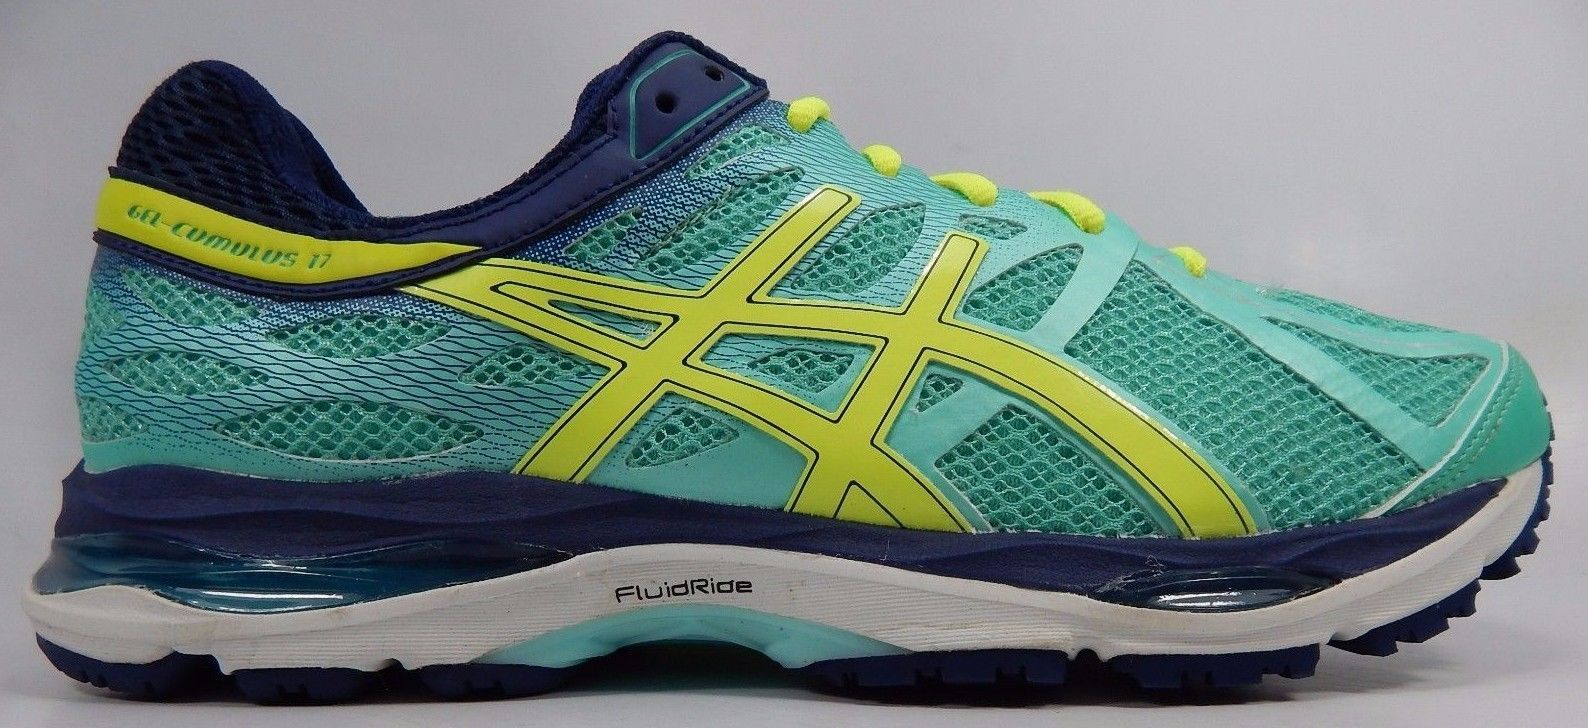 Asics Gel Cumulus 17 Women's Running Shoes Size US 12 M (B) EU 44.5 Green T5D8N